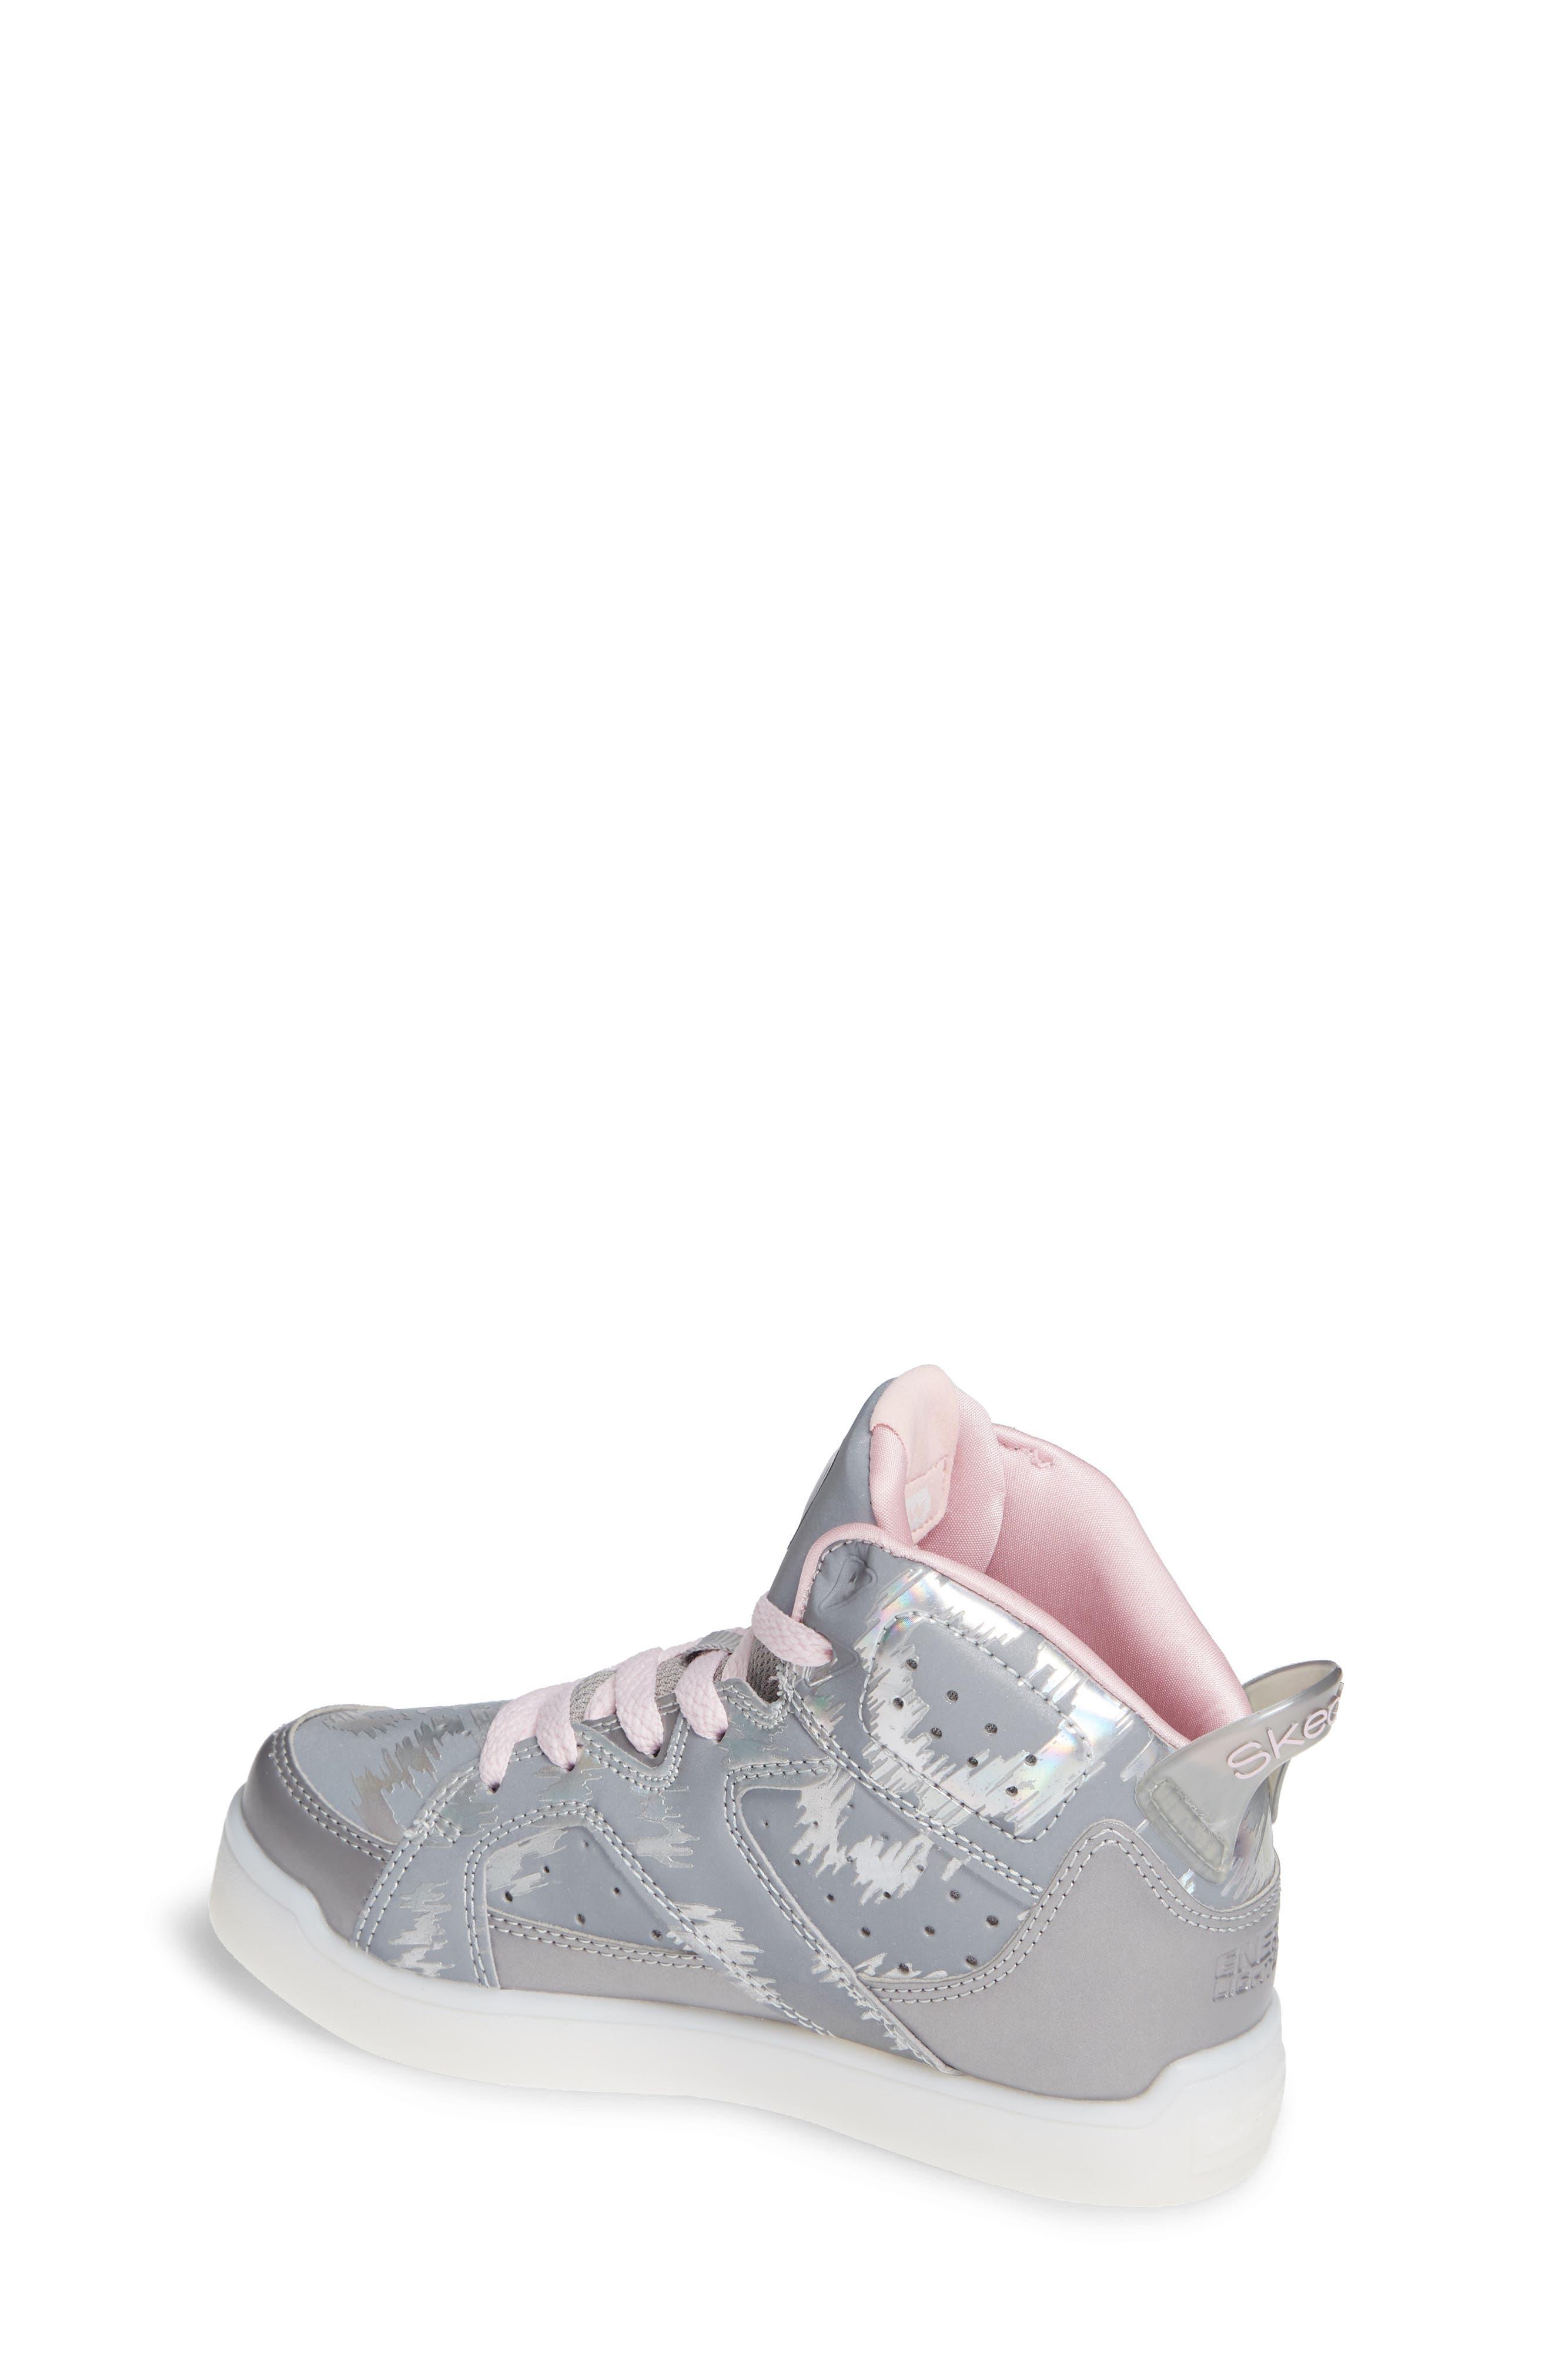 SKECHERS,                             Energy Lights Pro Reflecti-Fab Sneaker,                             Alternate thumbnail 2, color,                             040